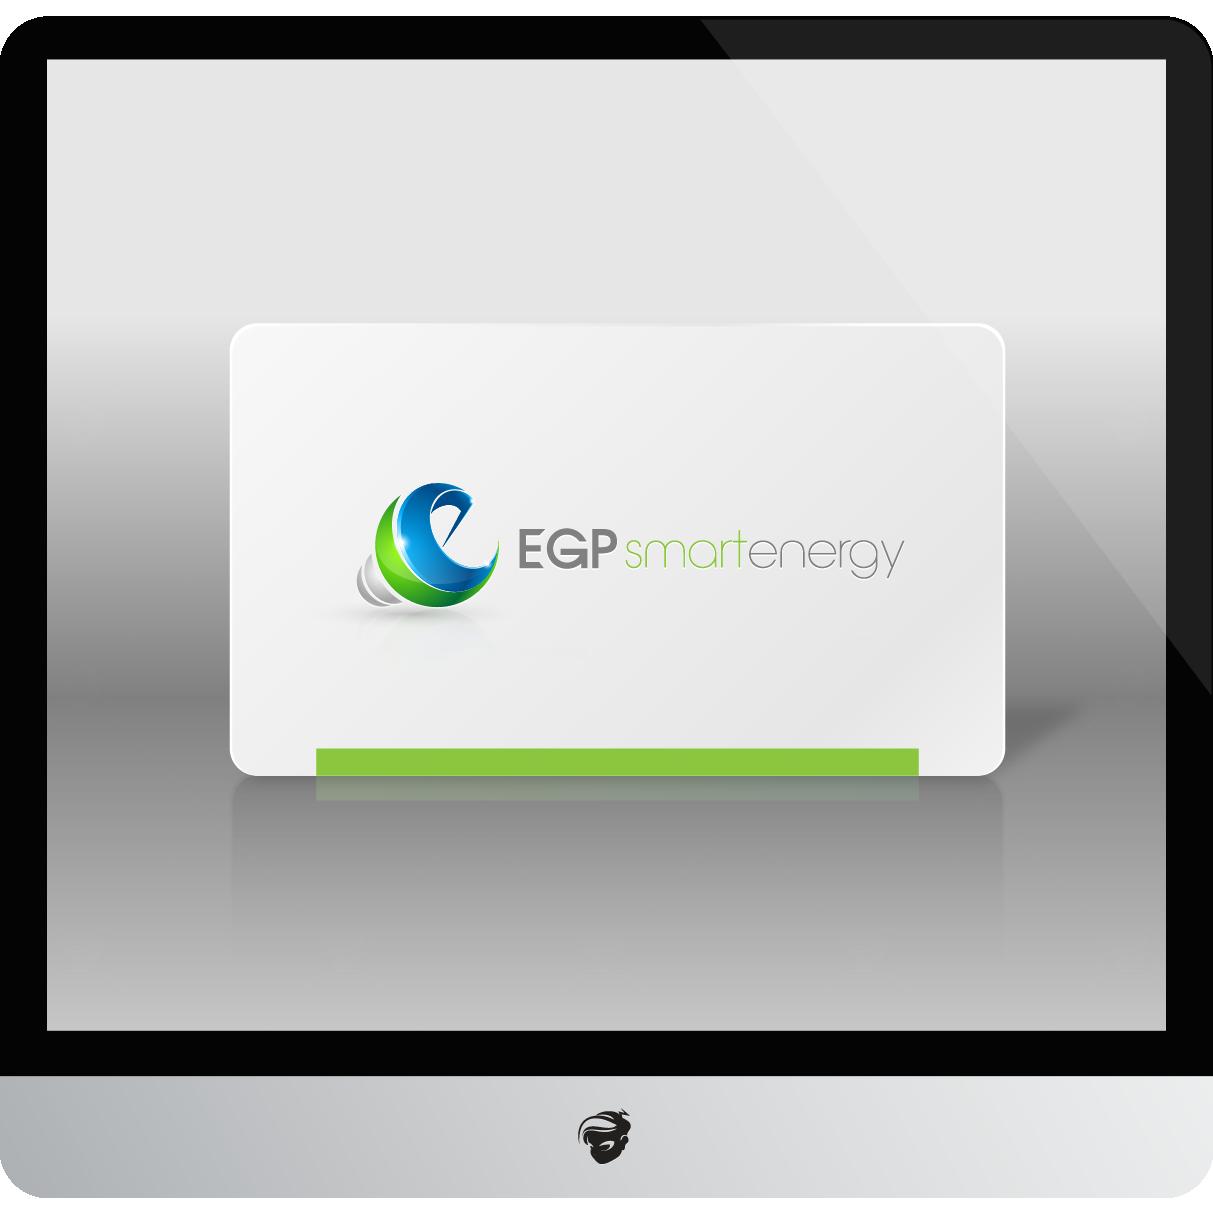 Logo Design by zesthar - Entry No. 92 in the Logo Design Contest Captivating Logo Design for EGP Smart Energy.